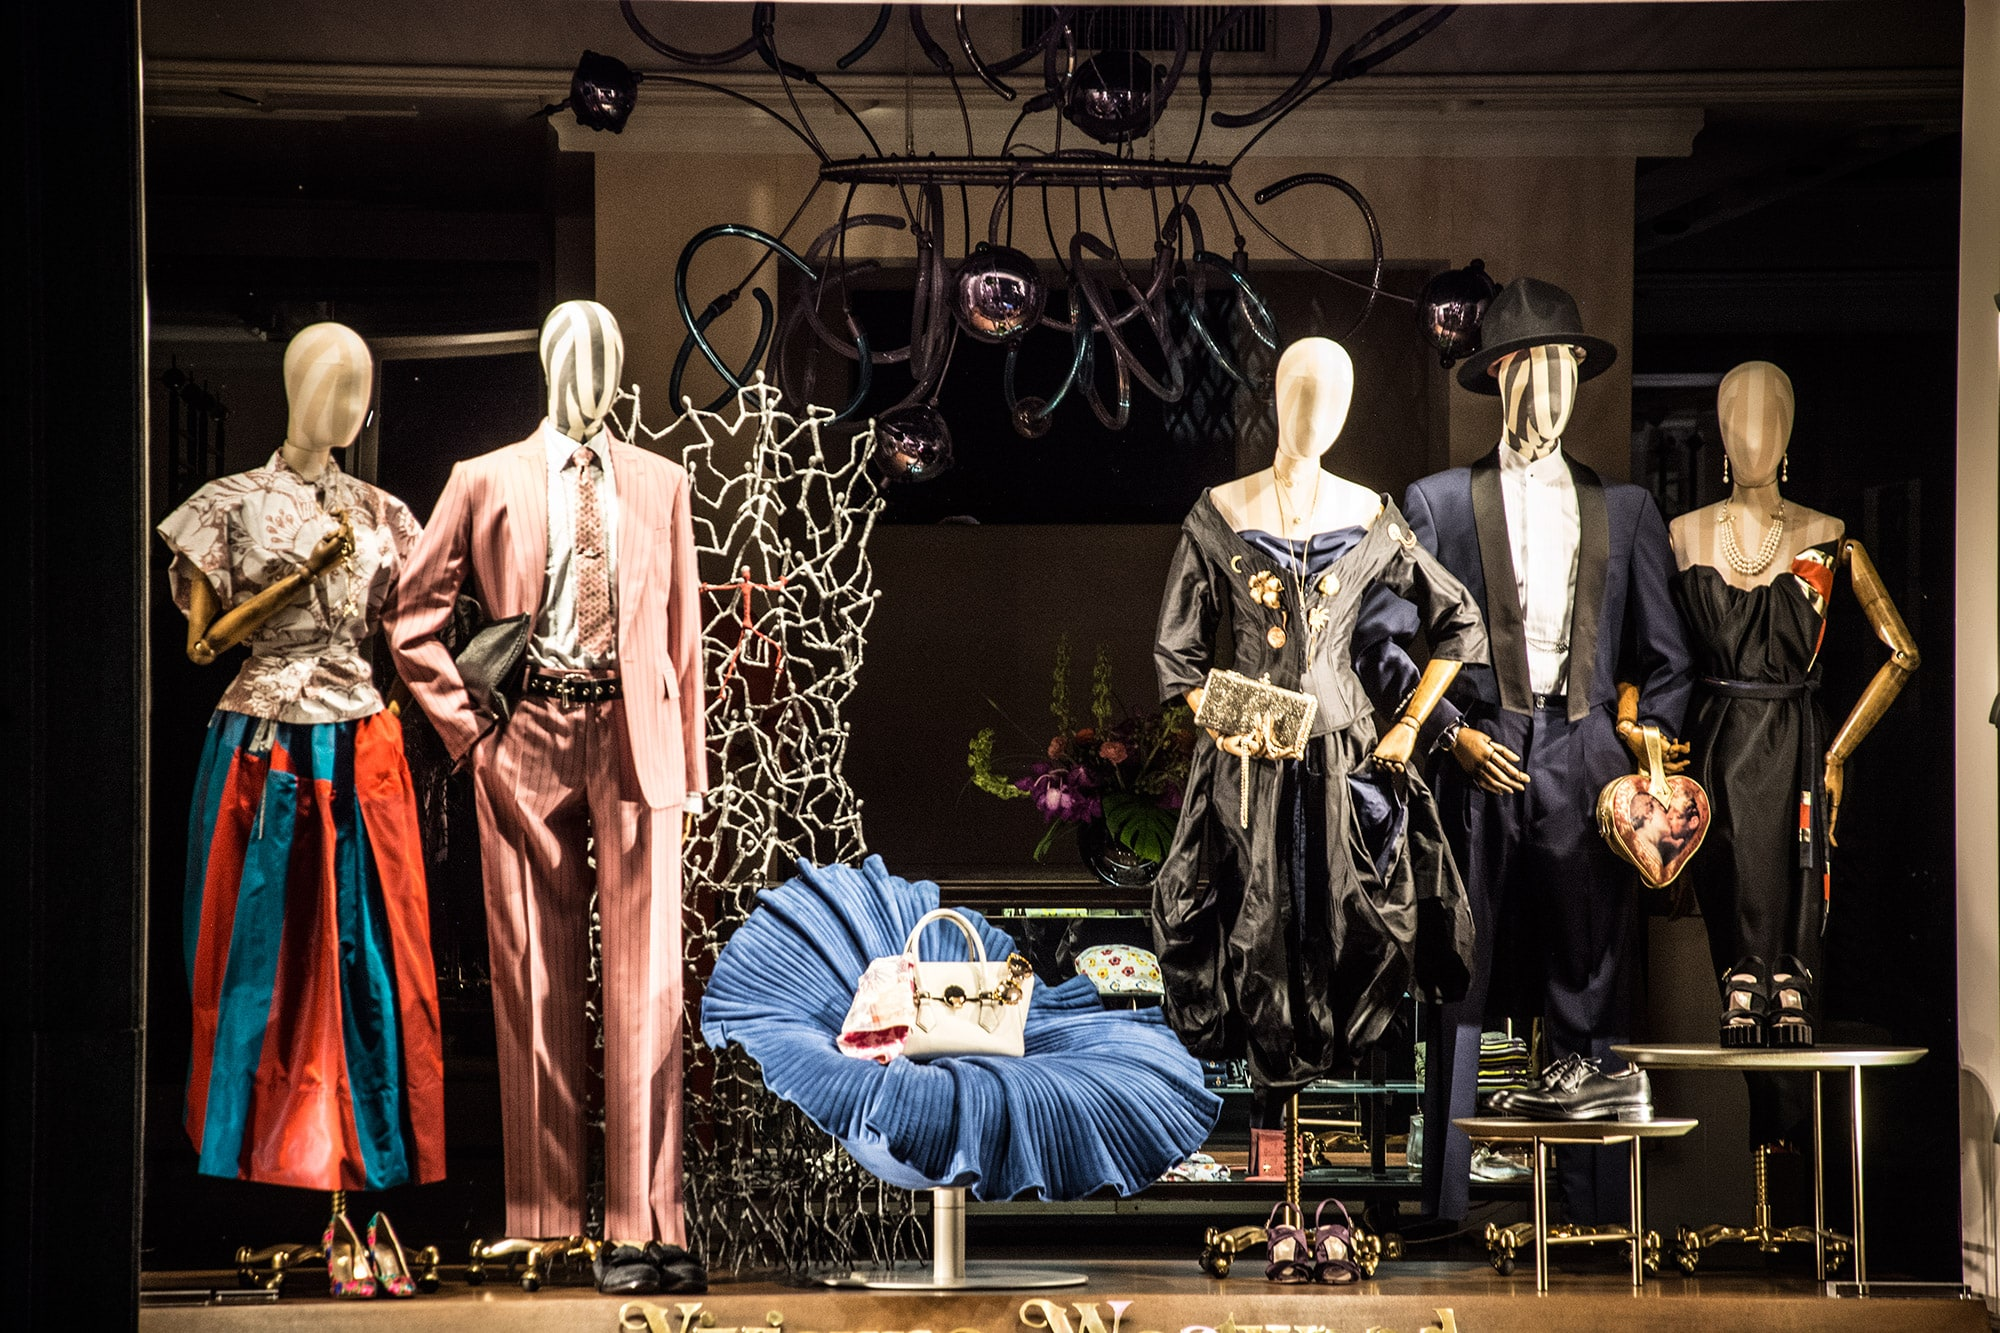 DSC 6377 min #общество Campari, wizzair, Брера, бутик, визы, Грузия, Дуомо, Италия, Кутаиси, Ла Скала, Милан, мода, шоппинг